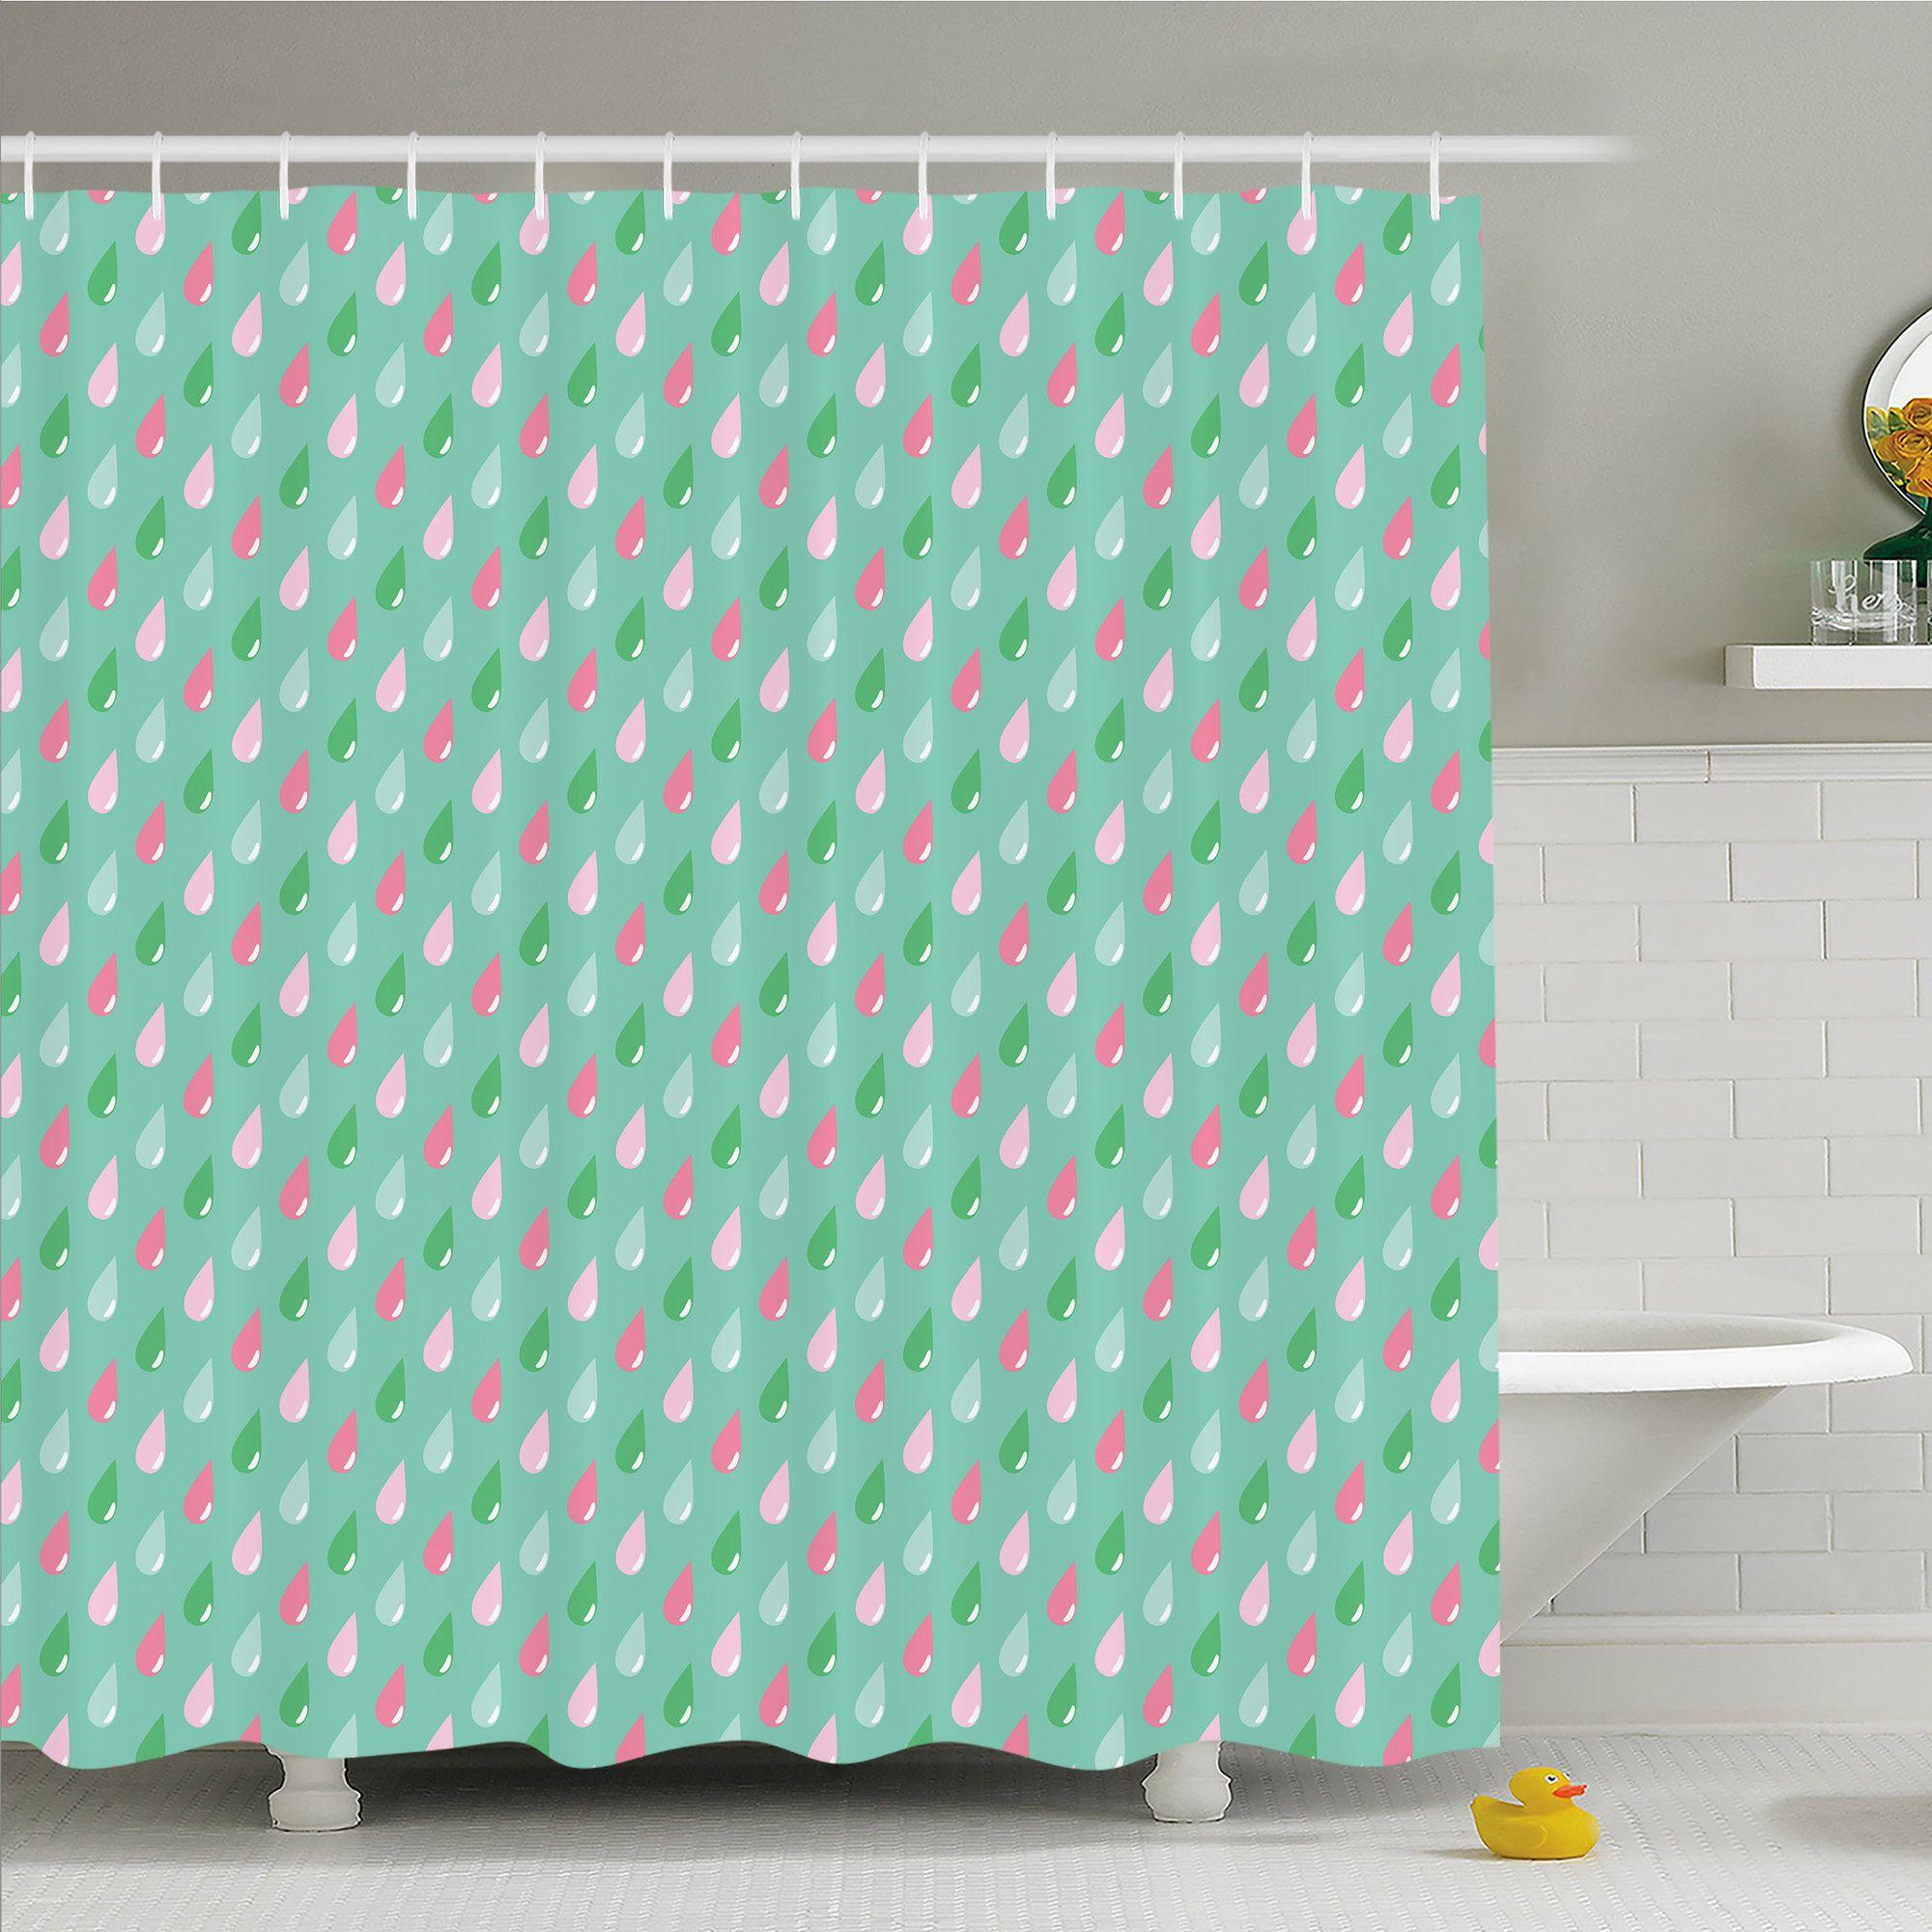 Home funny teardrops rain shower children image shower curtain set